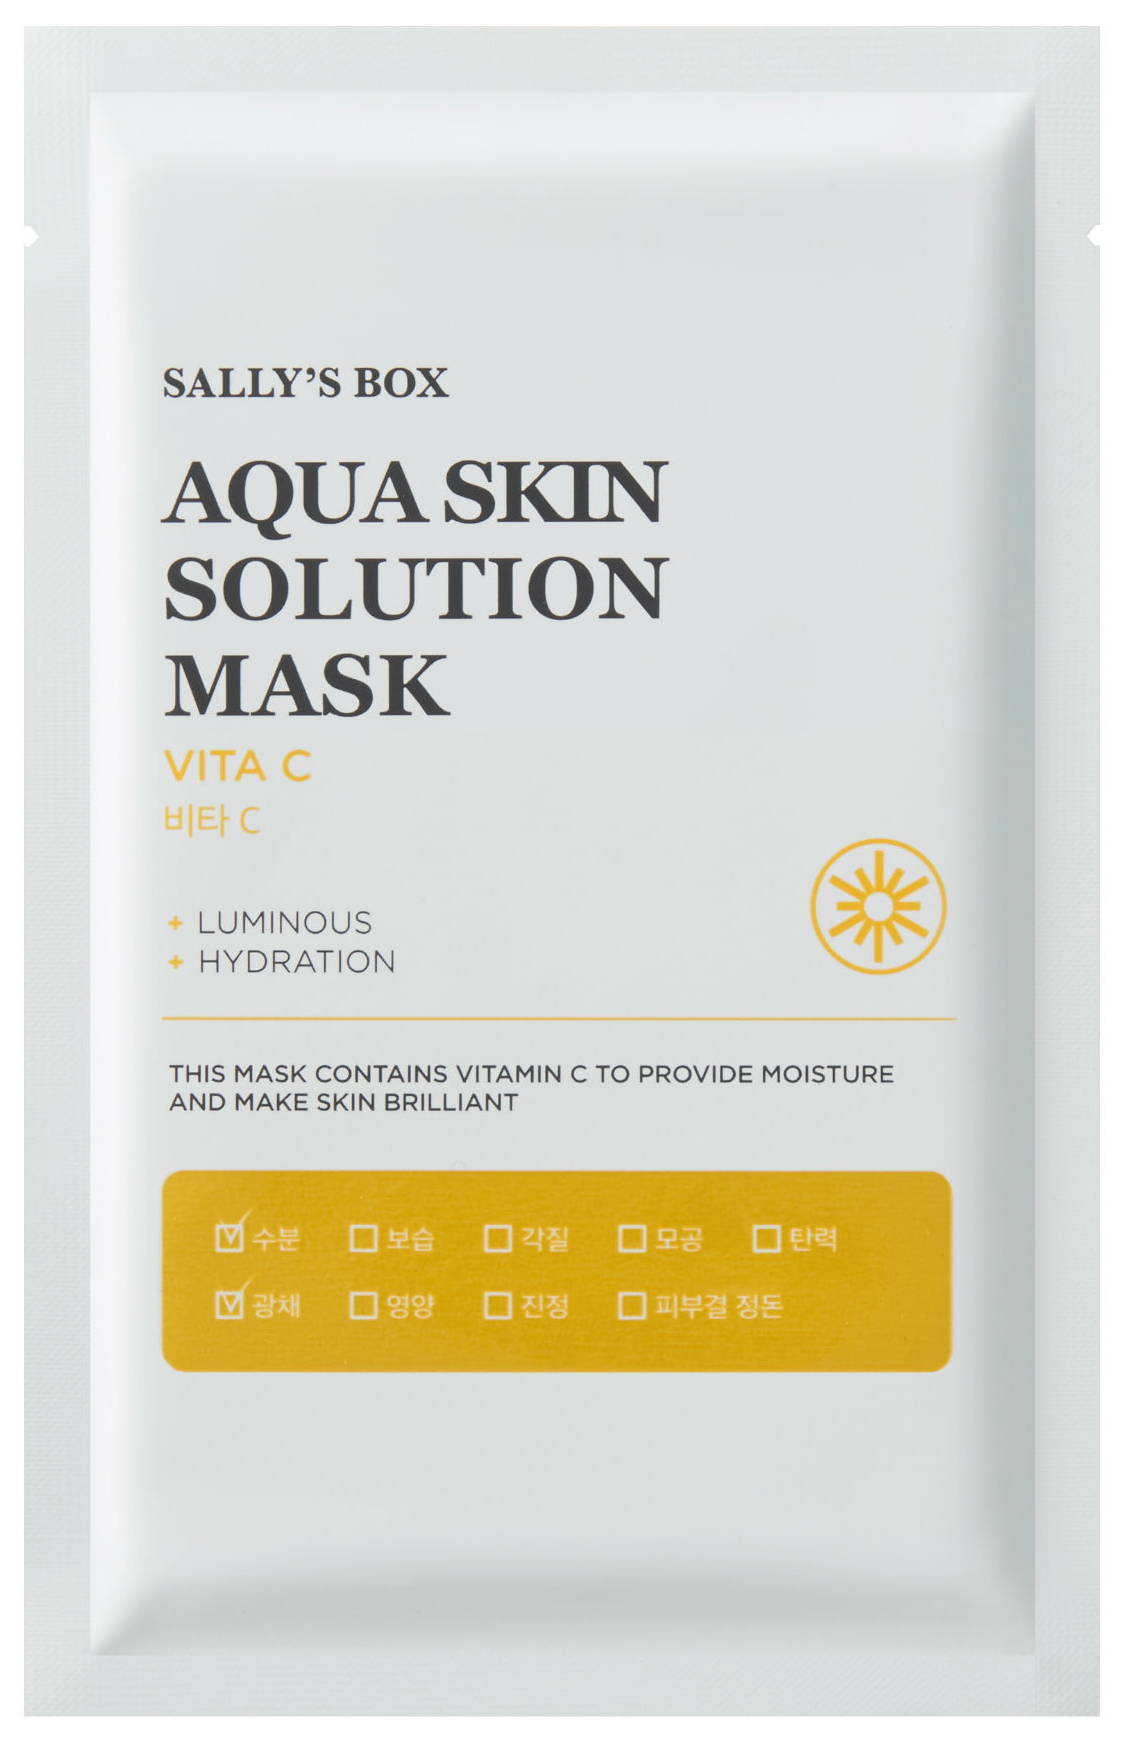 Маска для лица Sally's Box Aqua Skin Solution Mask Vita C 22 мл  - Купить